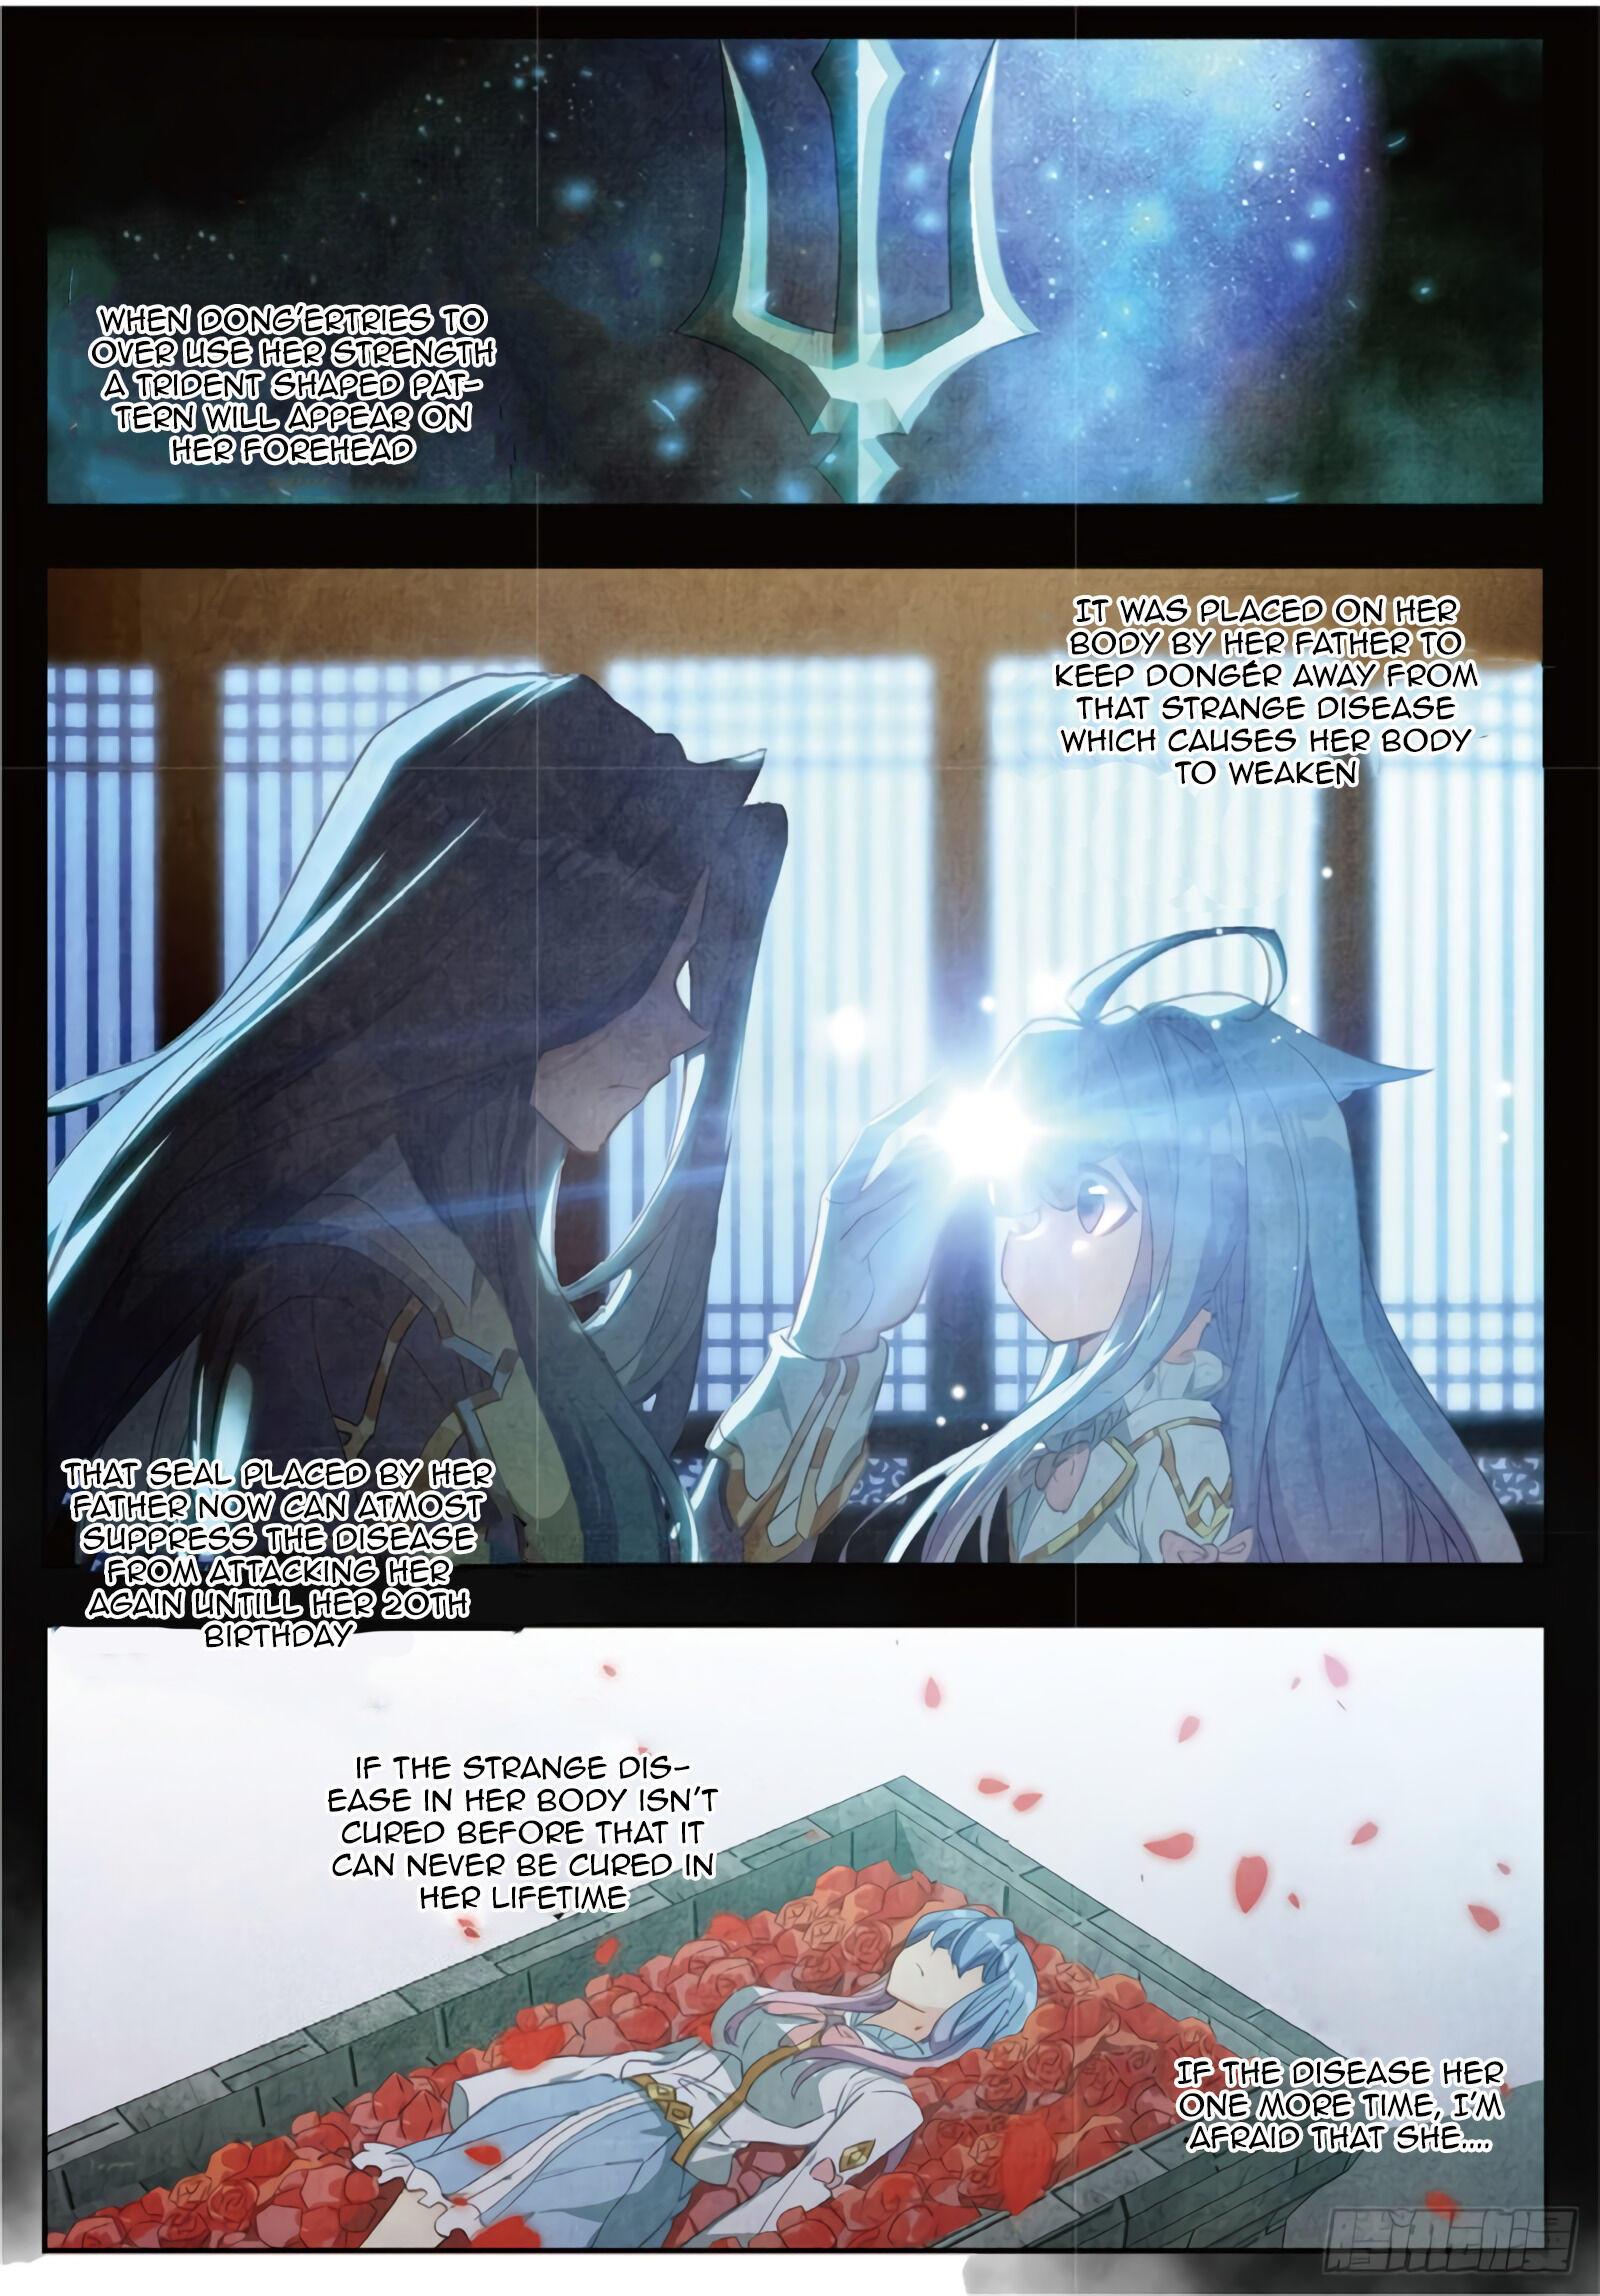 Douluo Dalu Ii - Jueshui Tangmen Chapter 283 page 3 - Mangakakalot